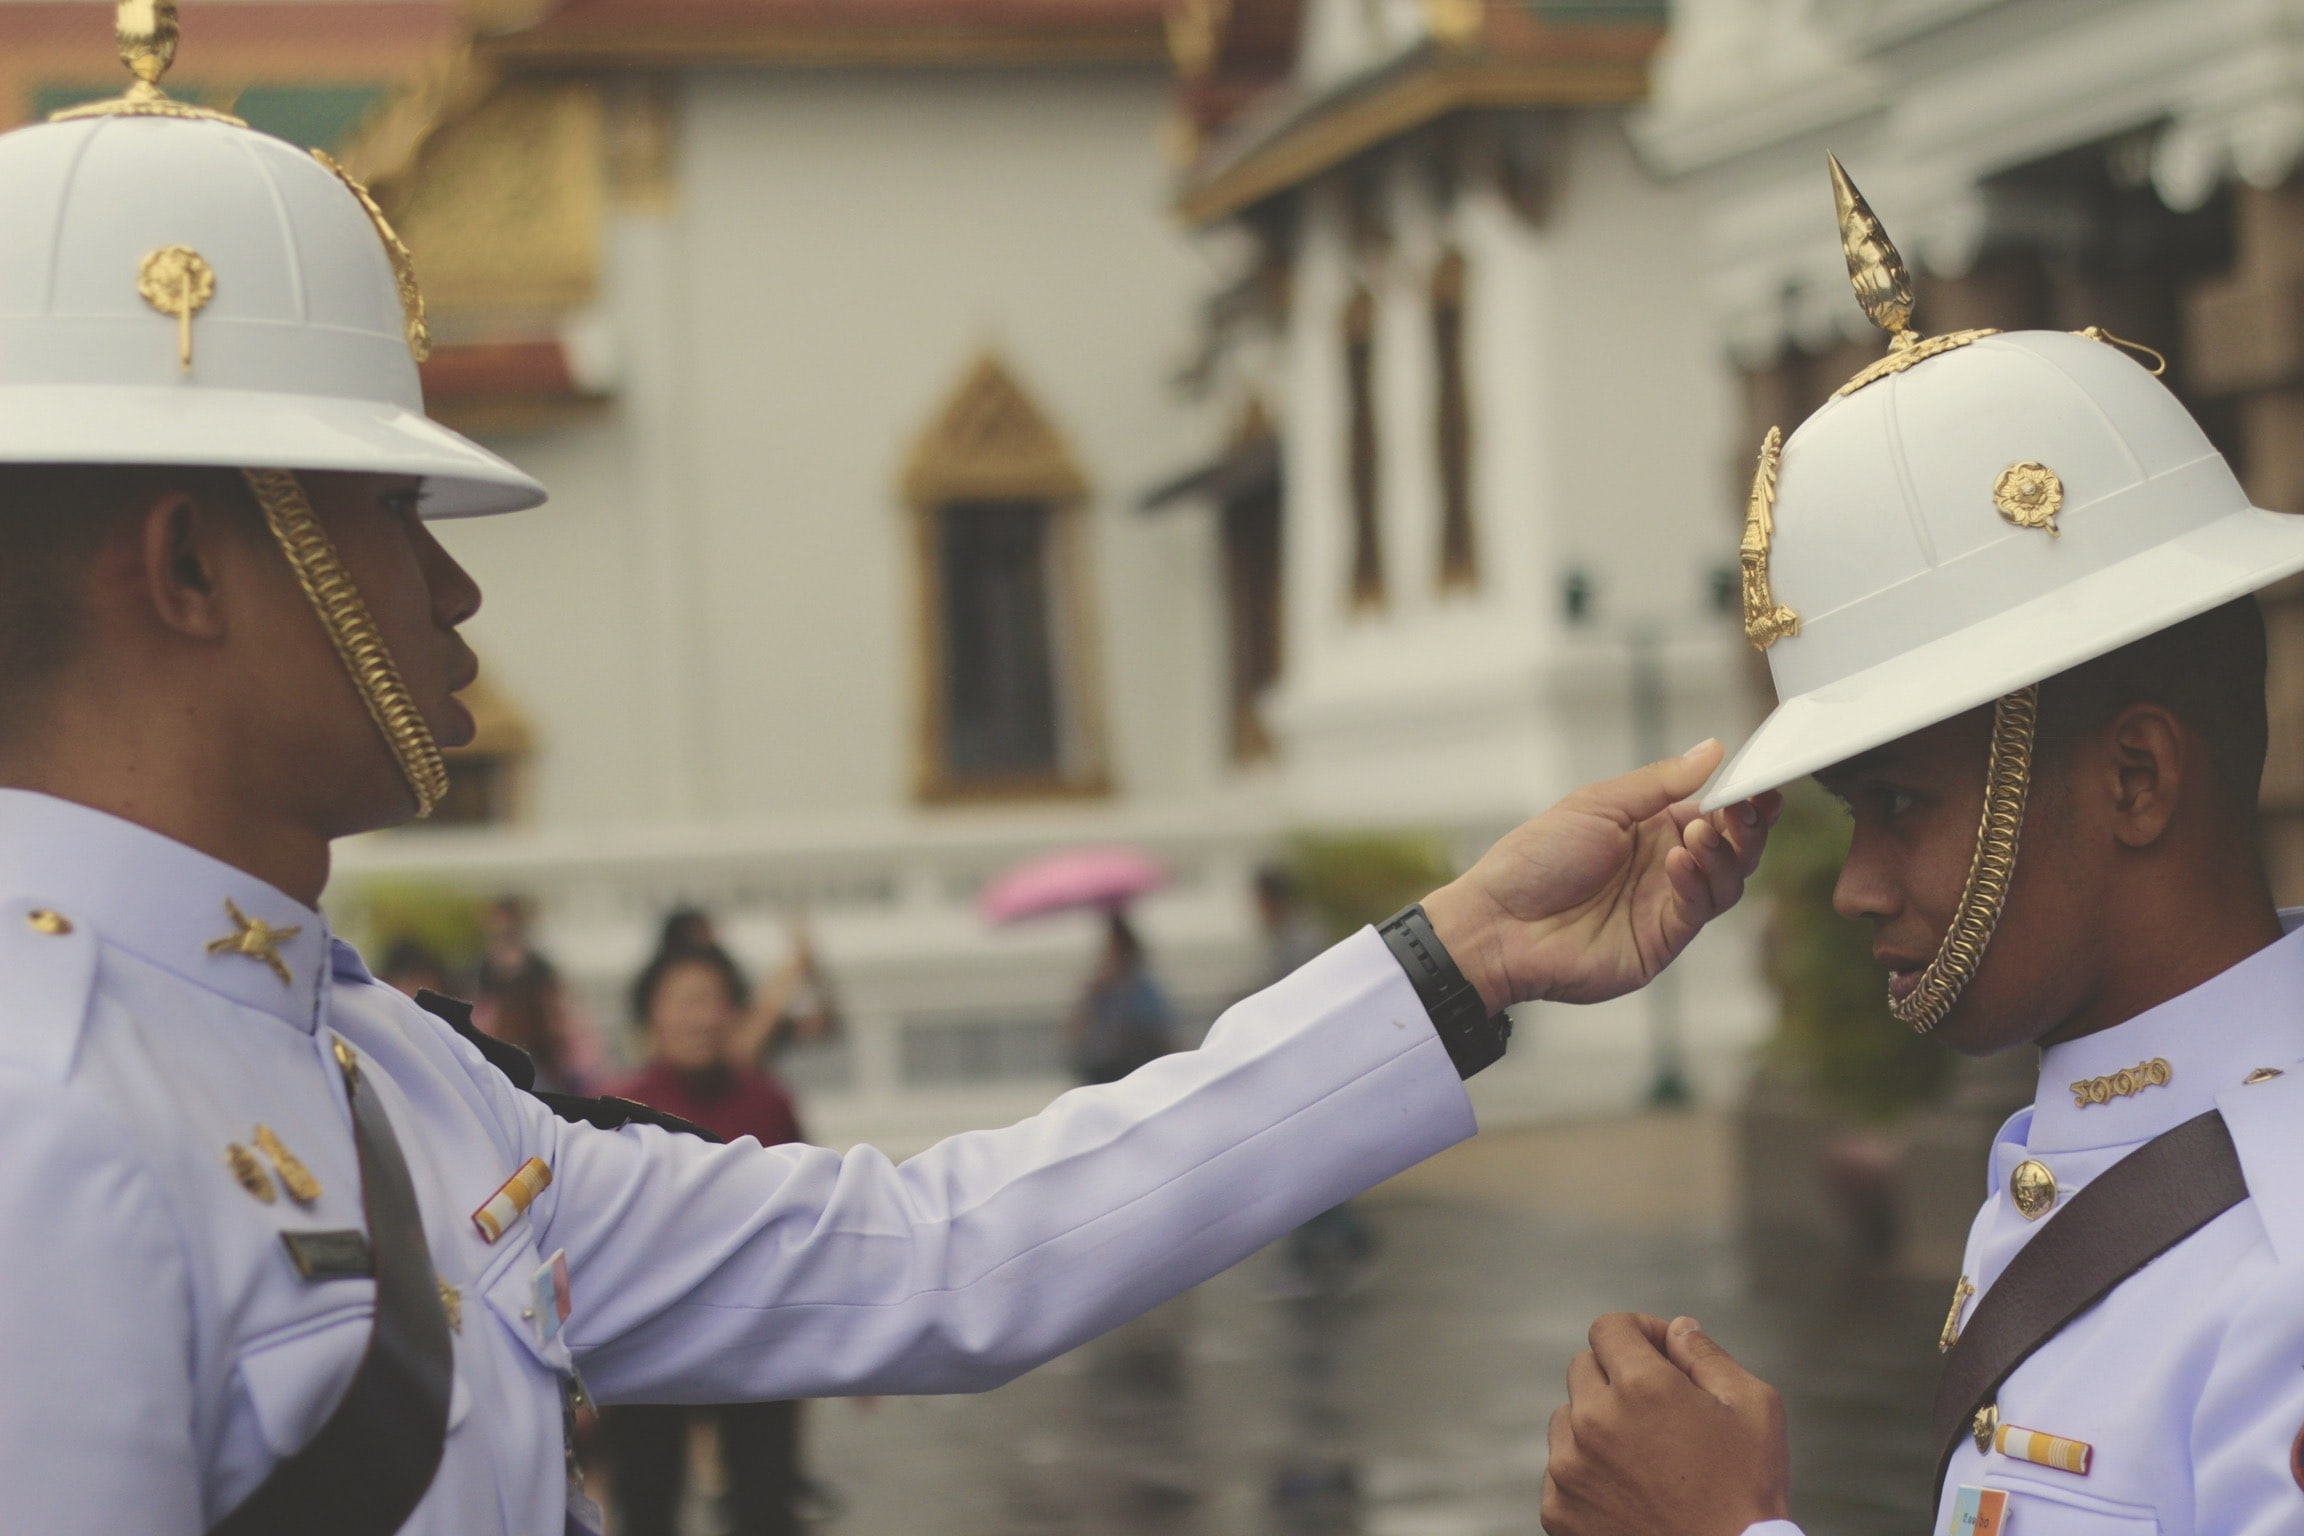 officer in white uniform touching man's white hat